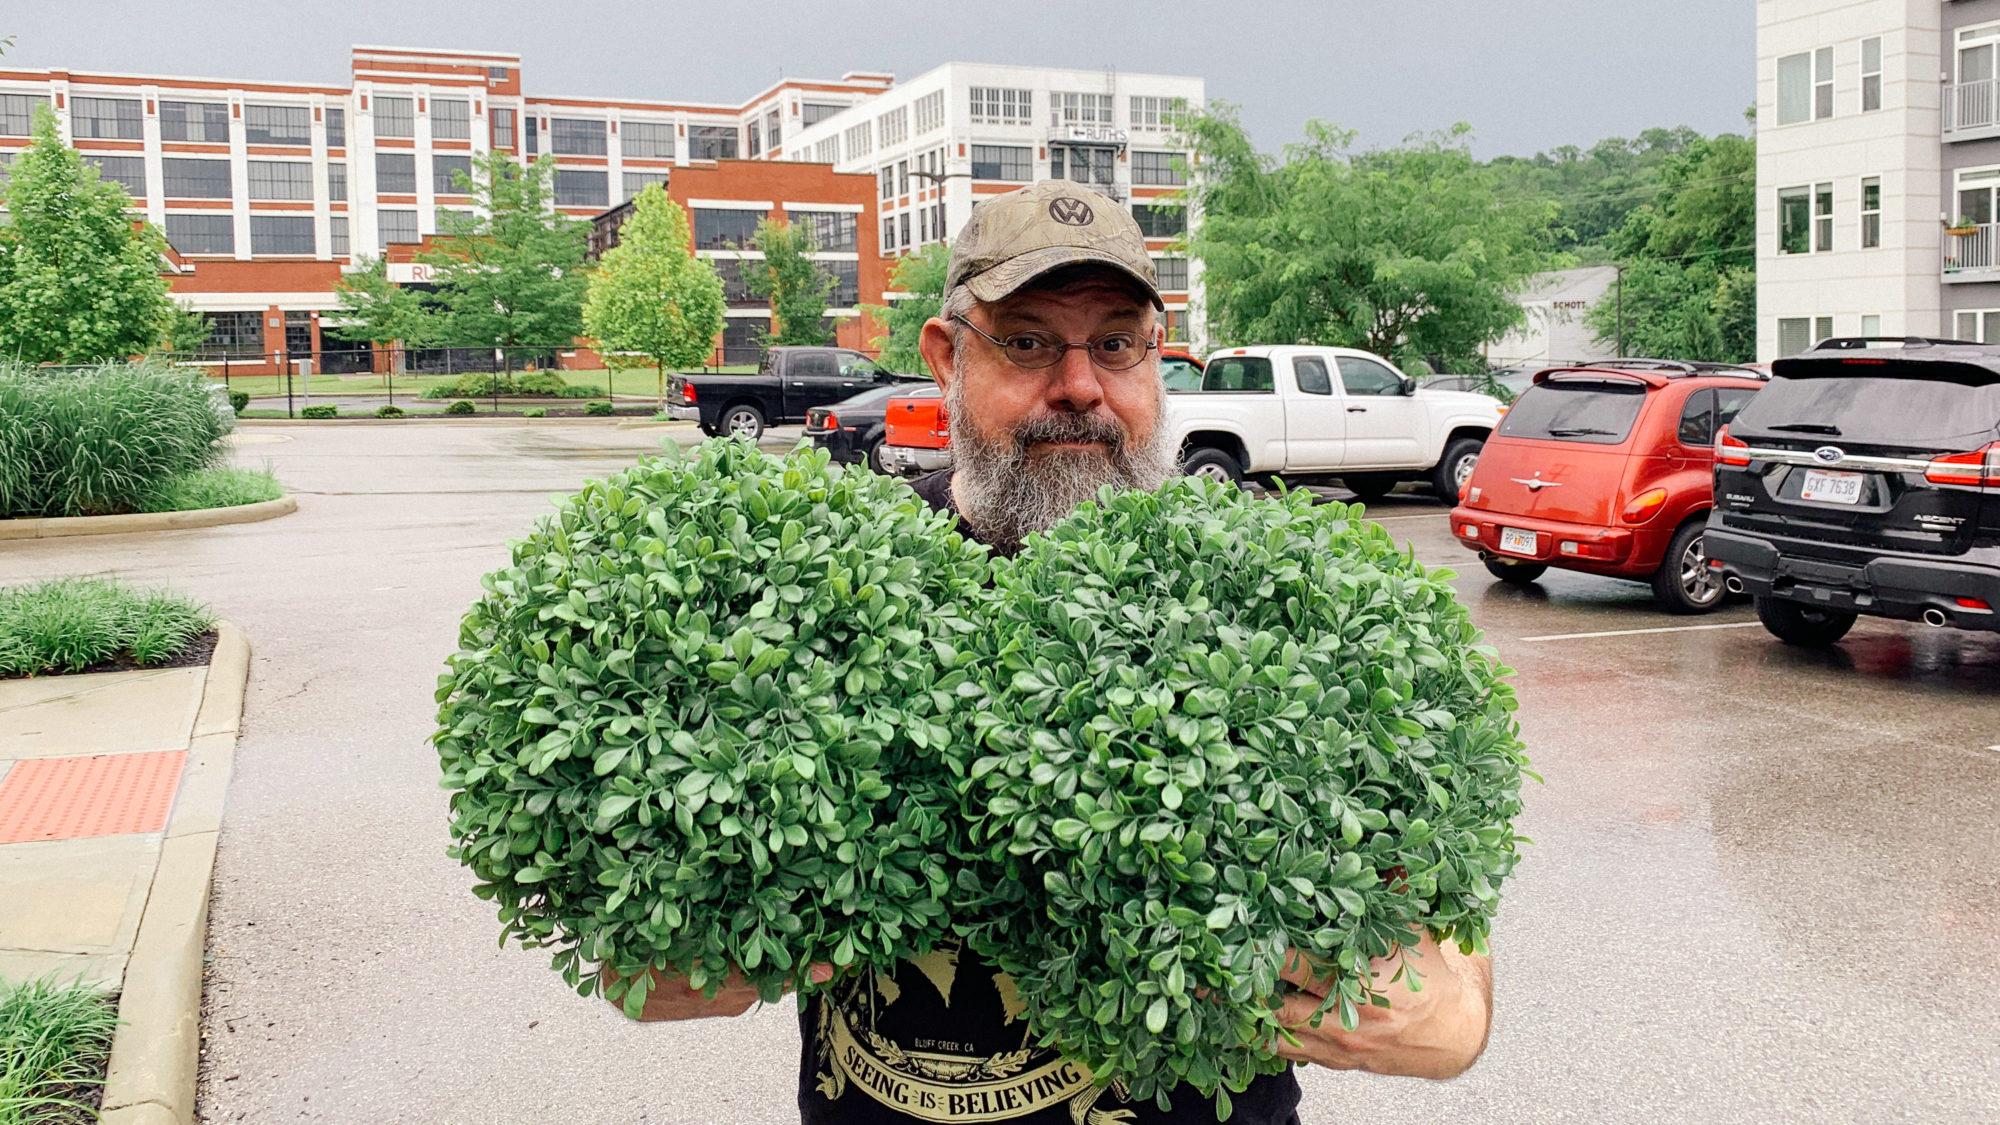 Jim Corbett of St. Louis holding two fake shrubberies